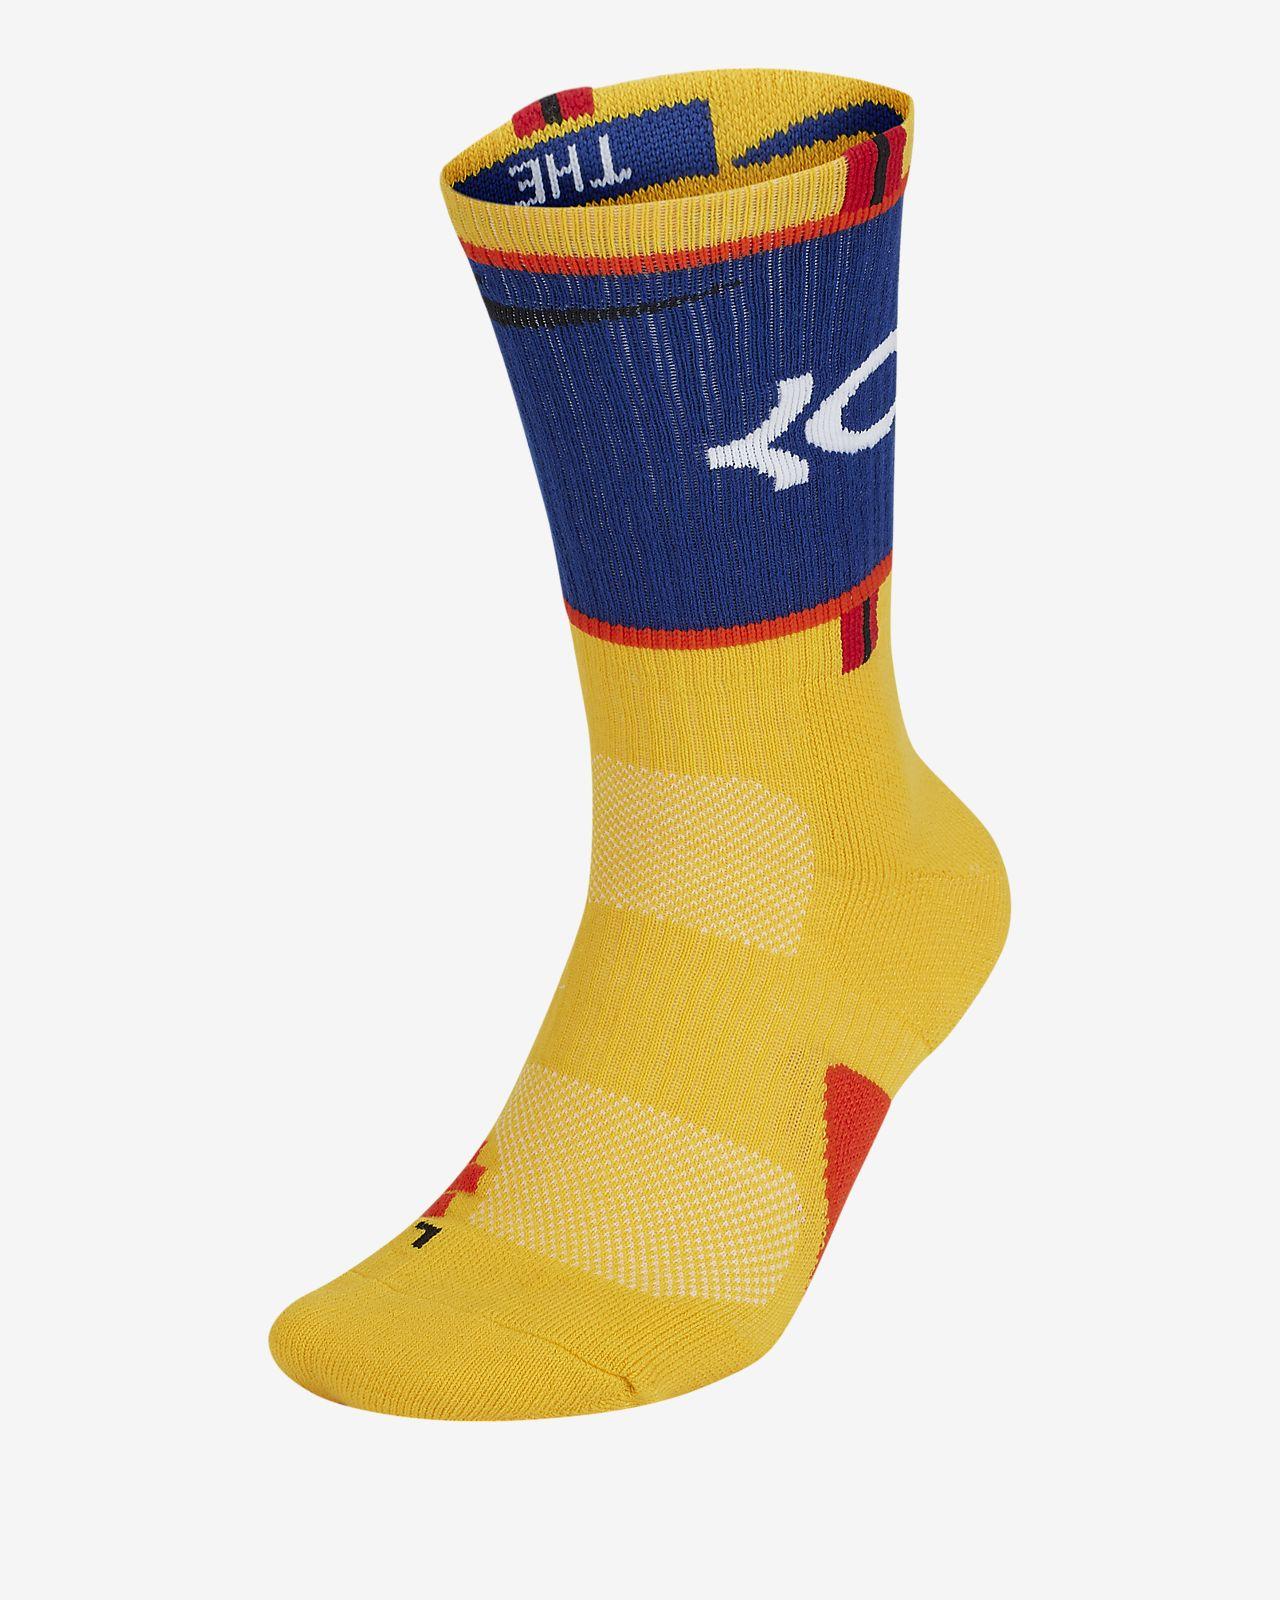 KD Elite Basketball Crew Socks (1 Pair)